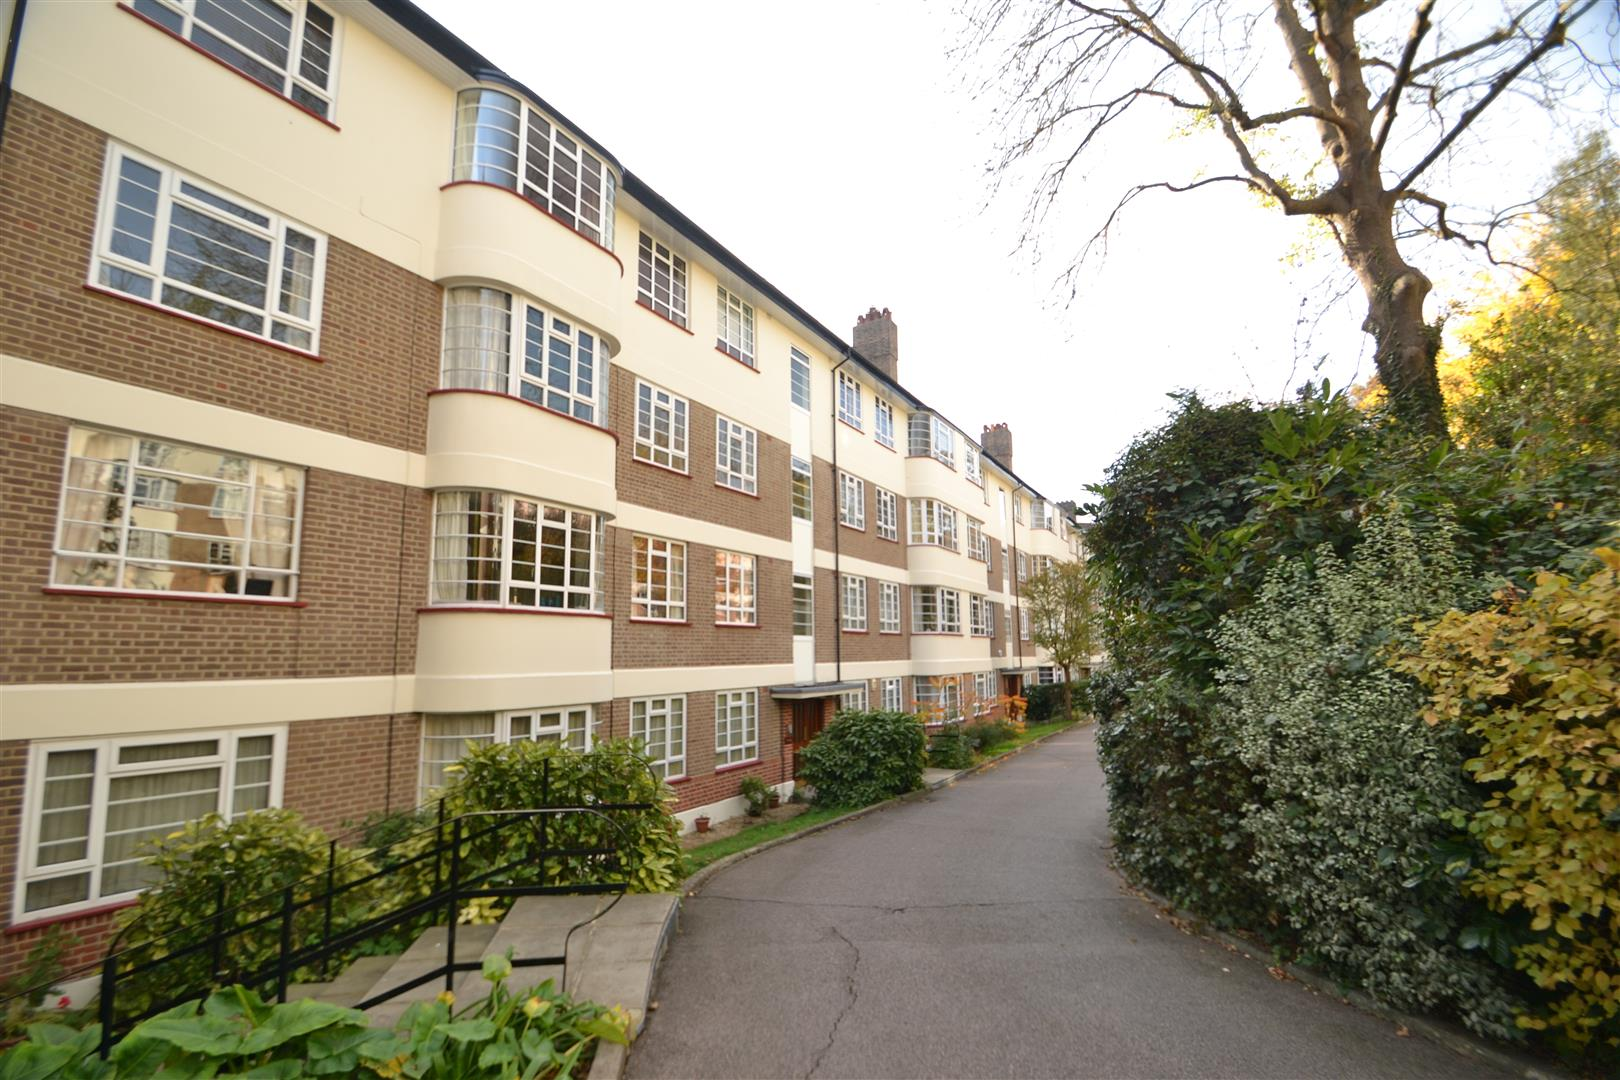 Edge Hill Court, Edge Hill, Wimbledon - Andrew Scott Robertson